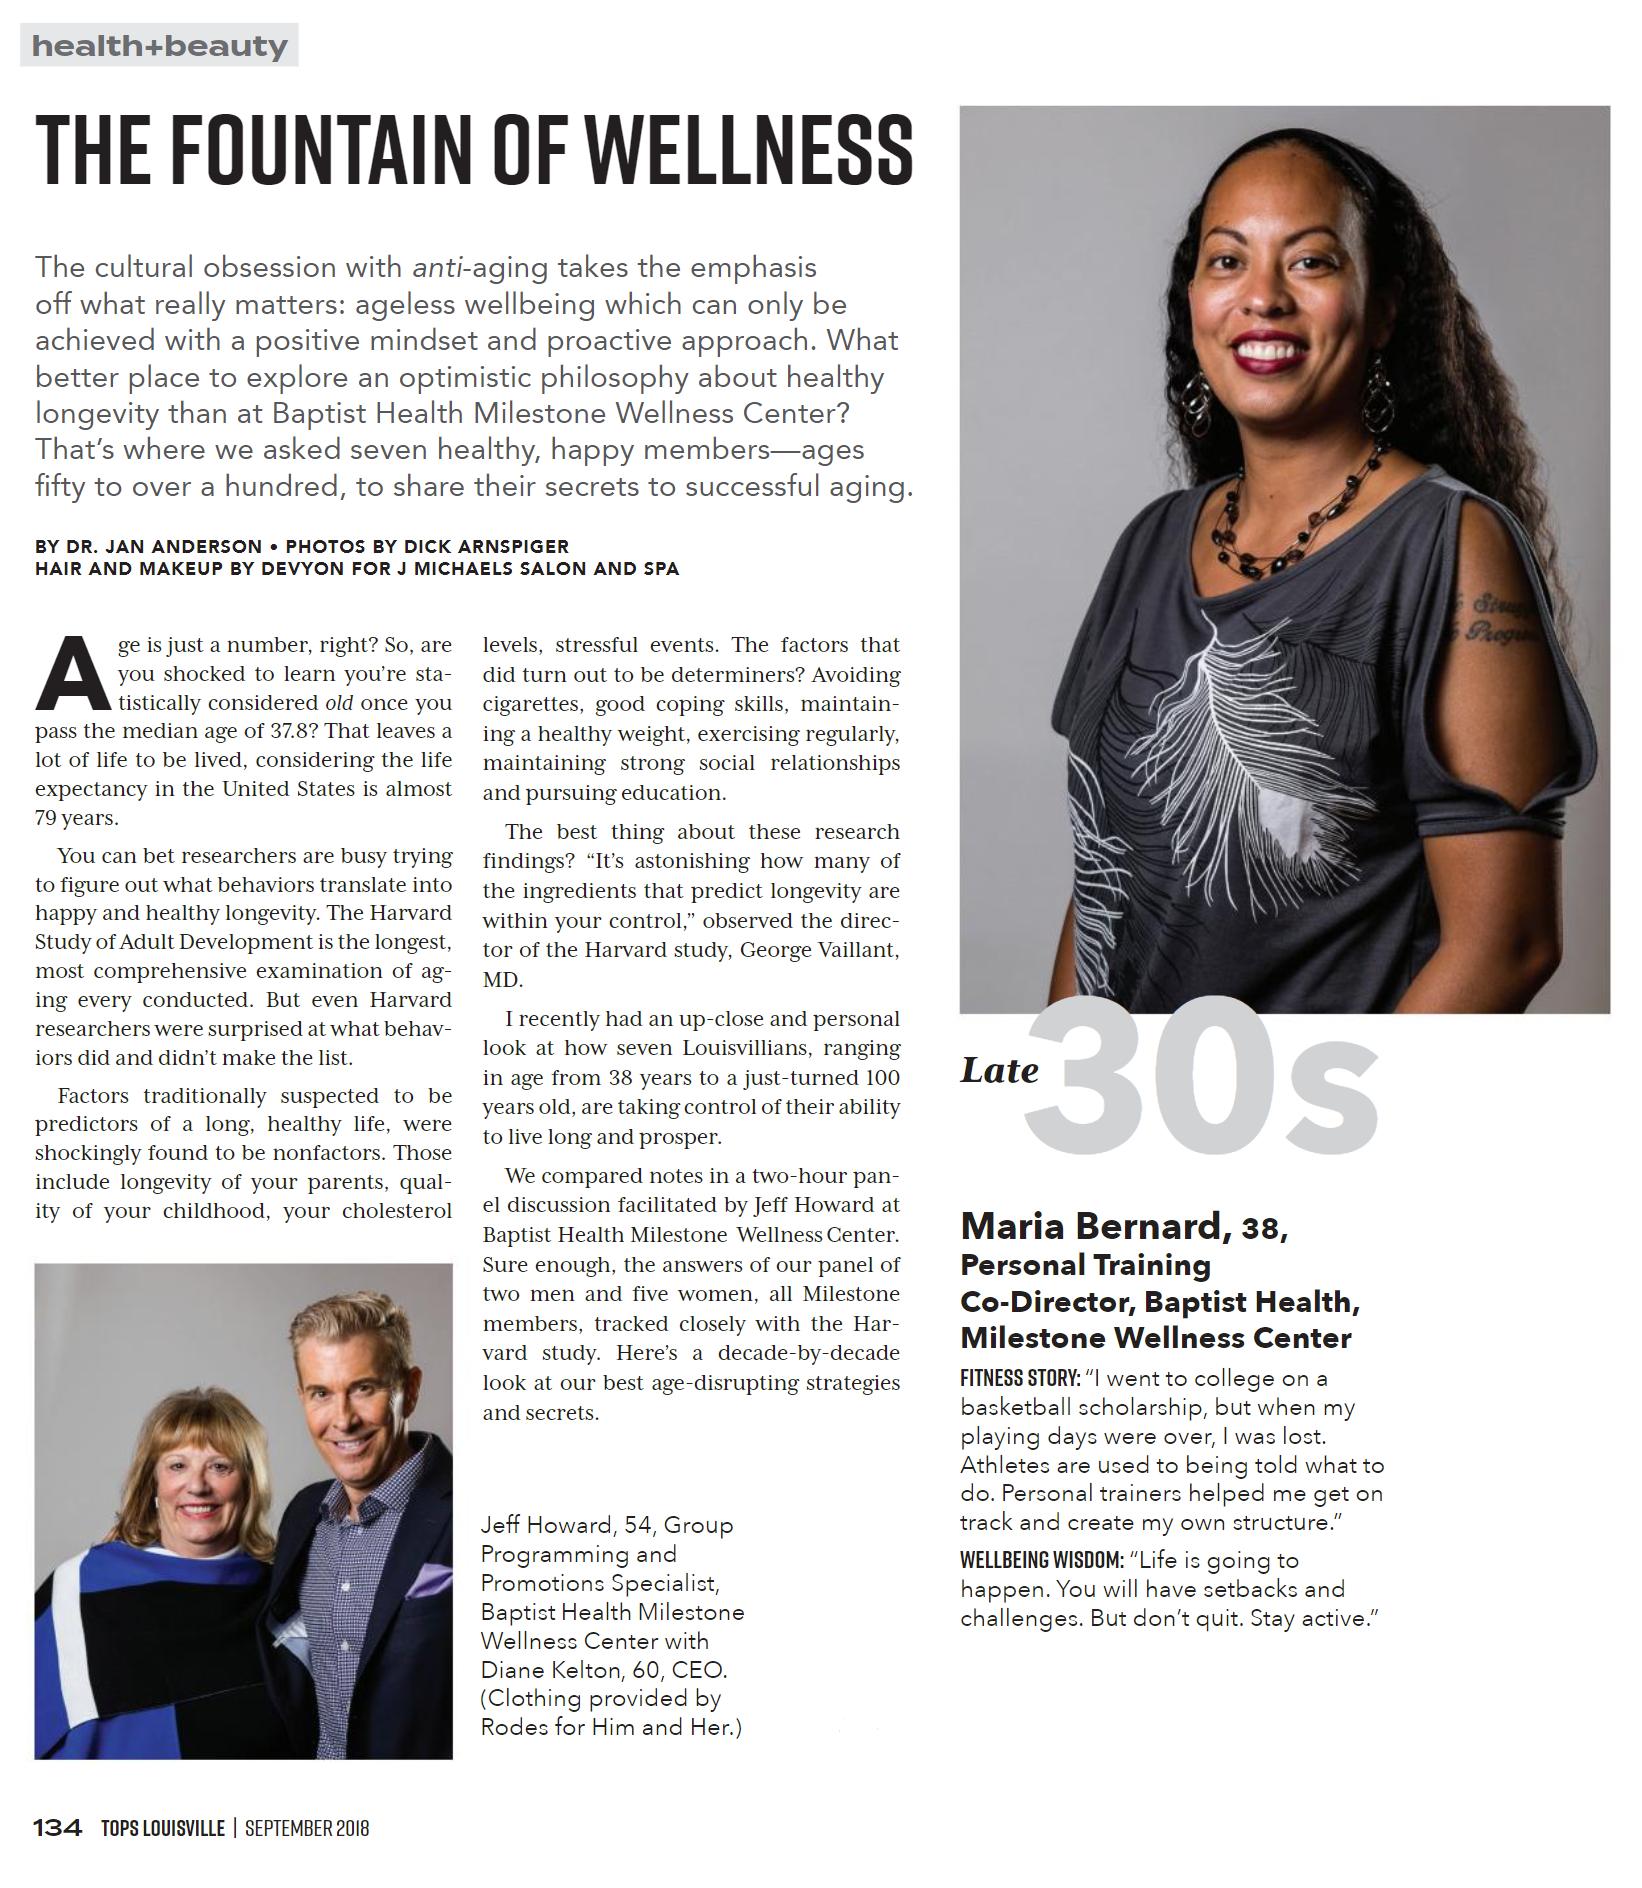 Fountain of Wellness